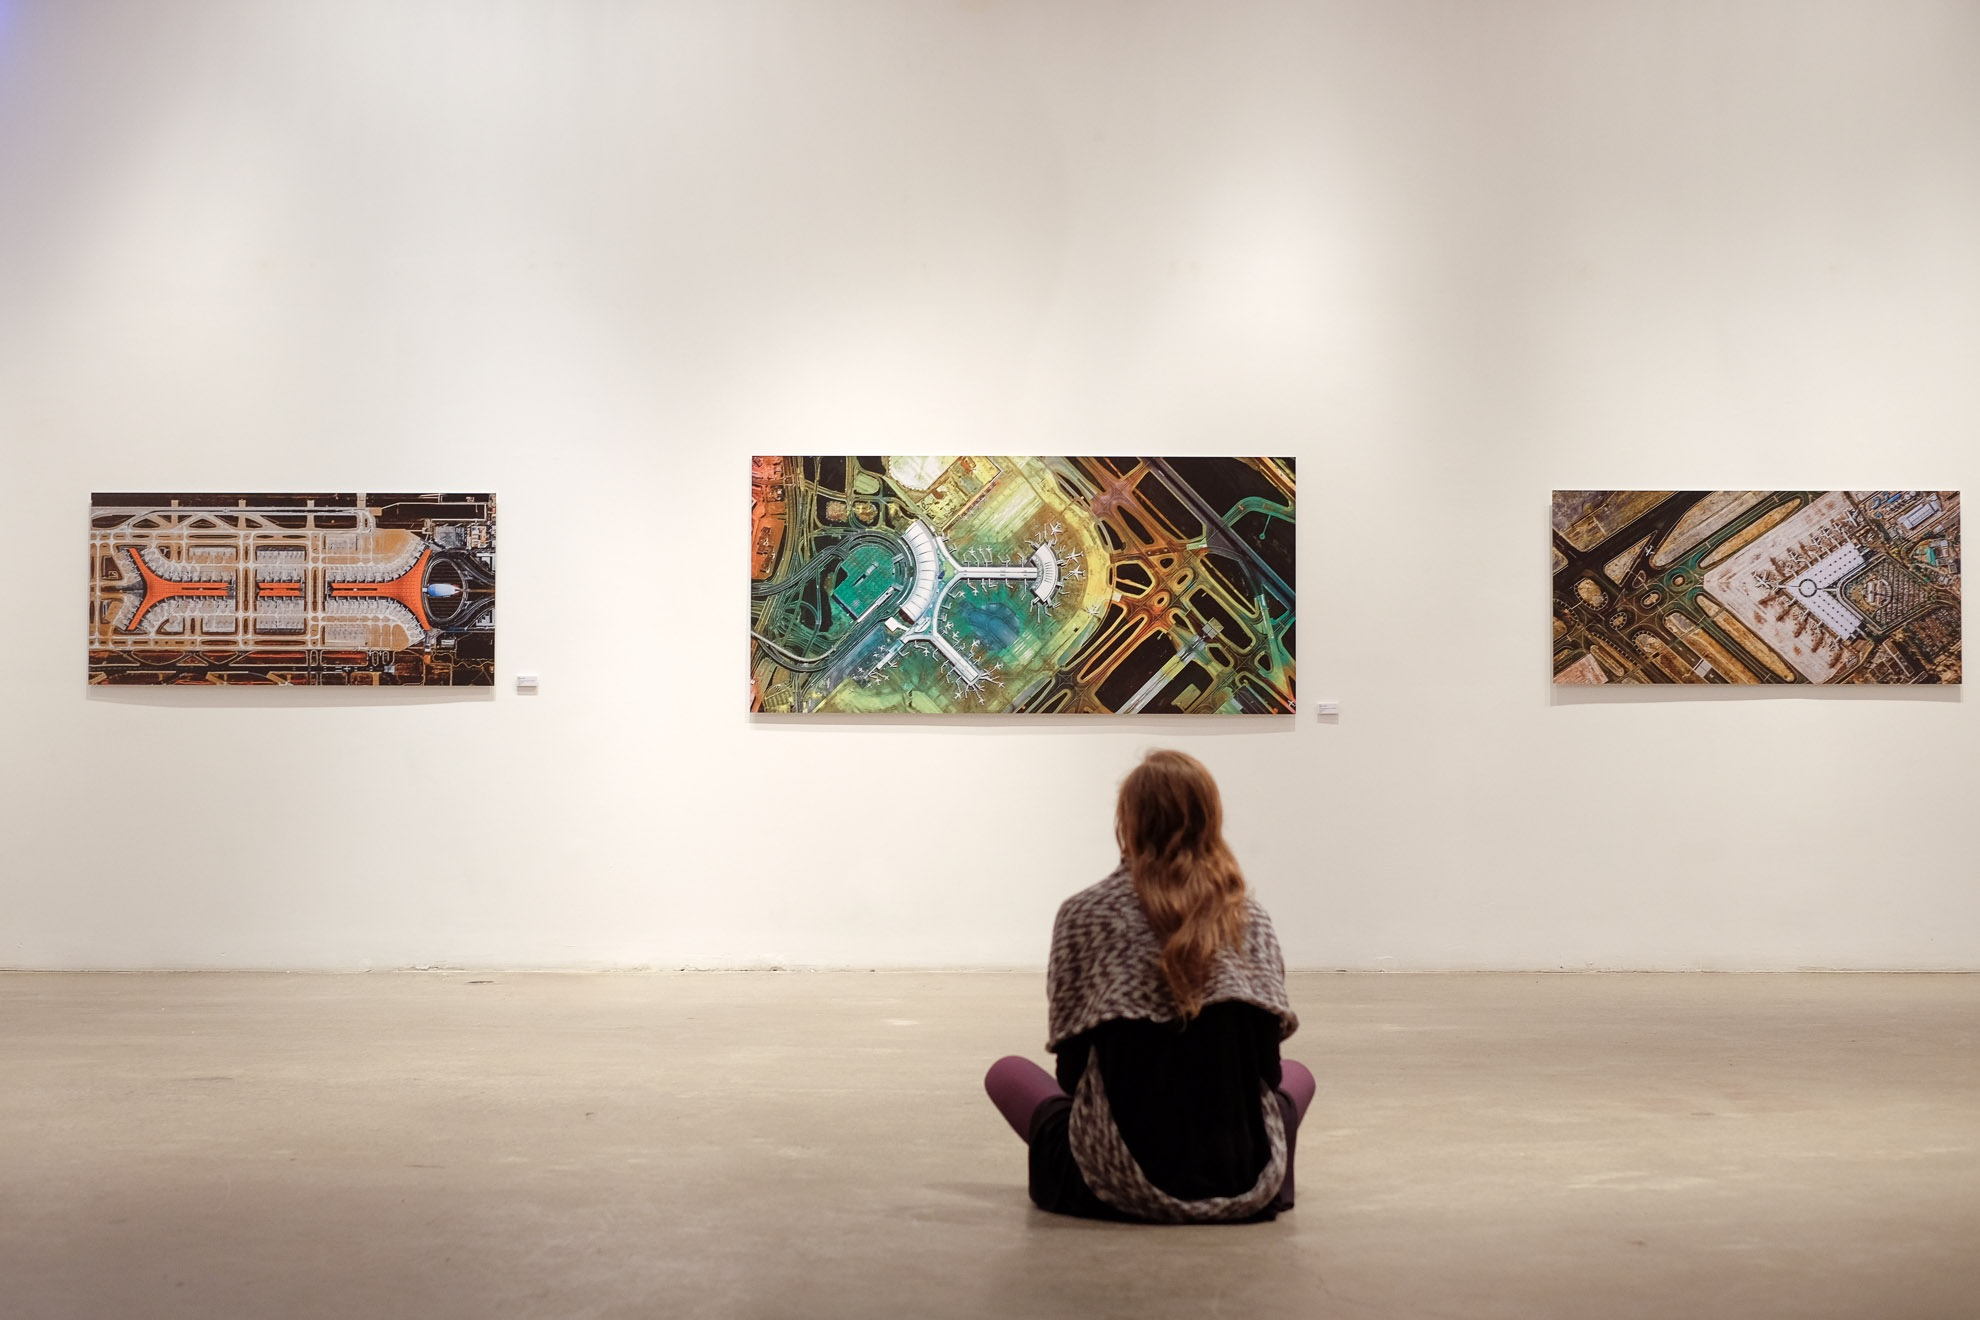 Ultradistancia-Taxonomies Exhibition at Onlyone Gallery Toronto. Installation shot.